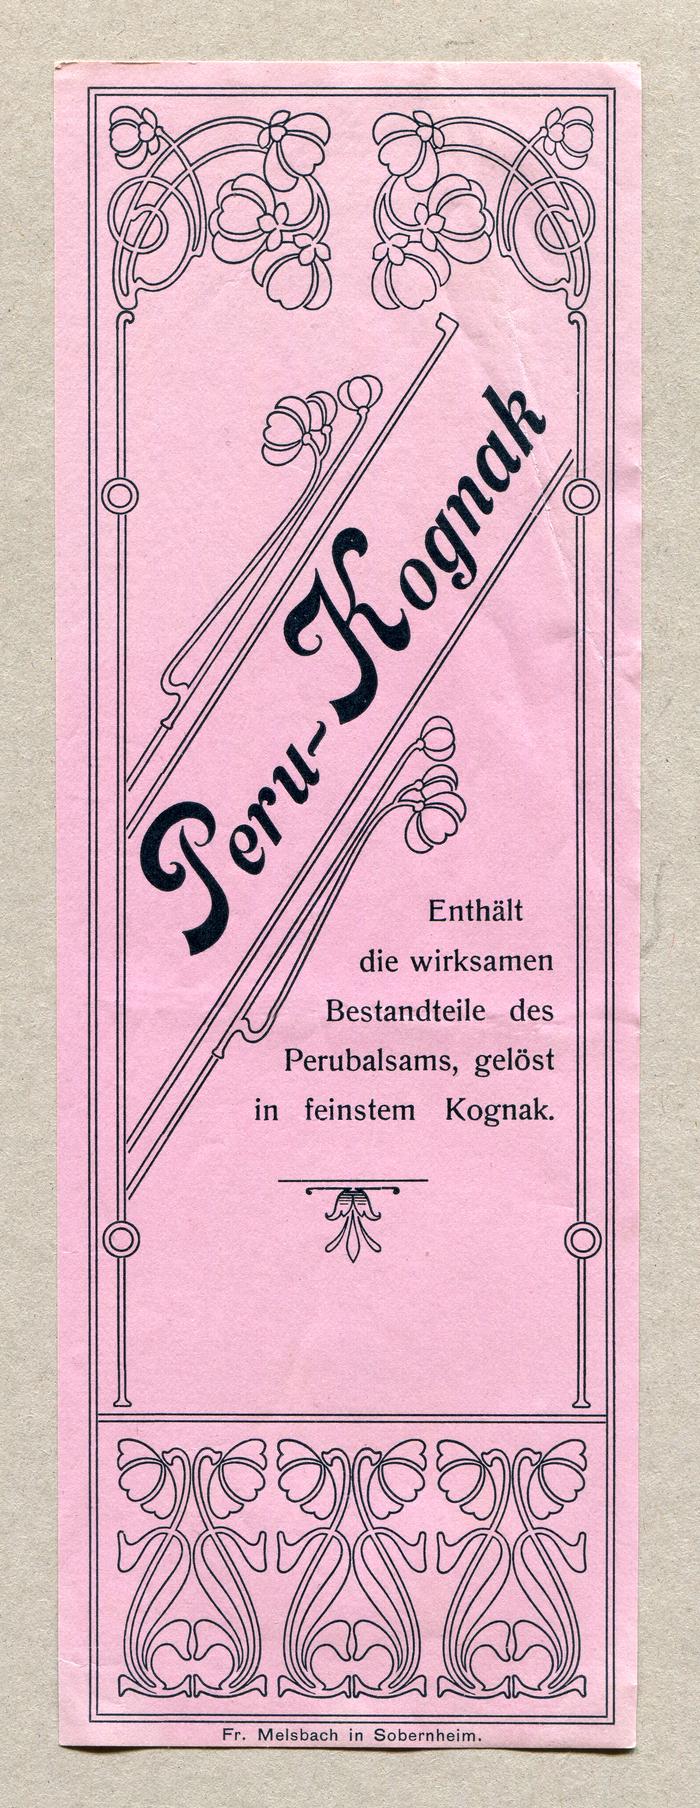 Peru-Kognak is set in Nelson, the German name for  (1895) The roman is Schelter & Giesecke's Romanisch (1889).